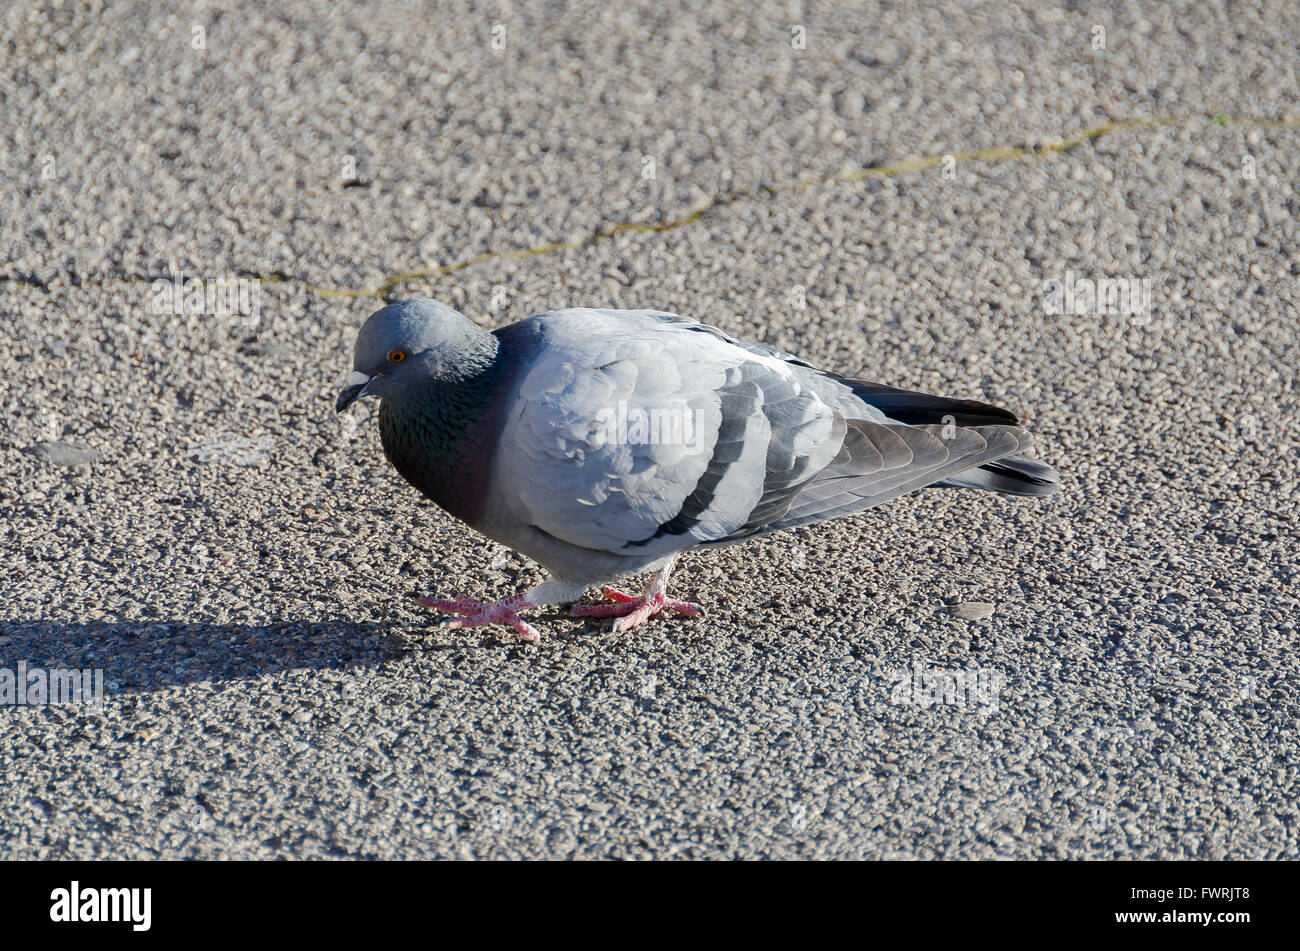 Pigeon, gros plan - Stock Image